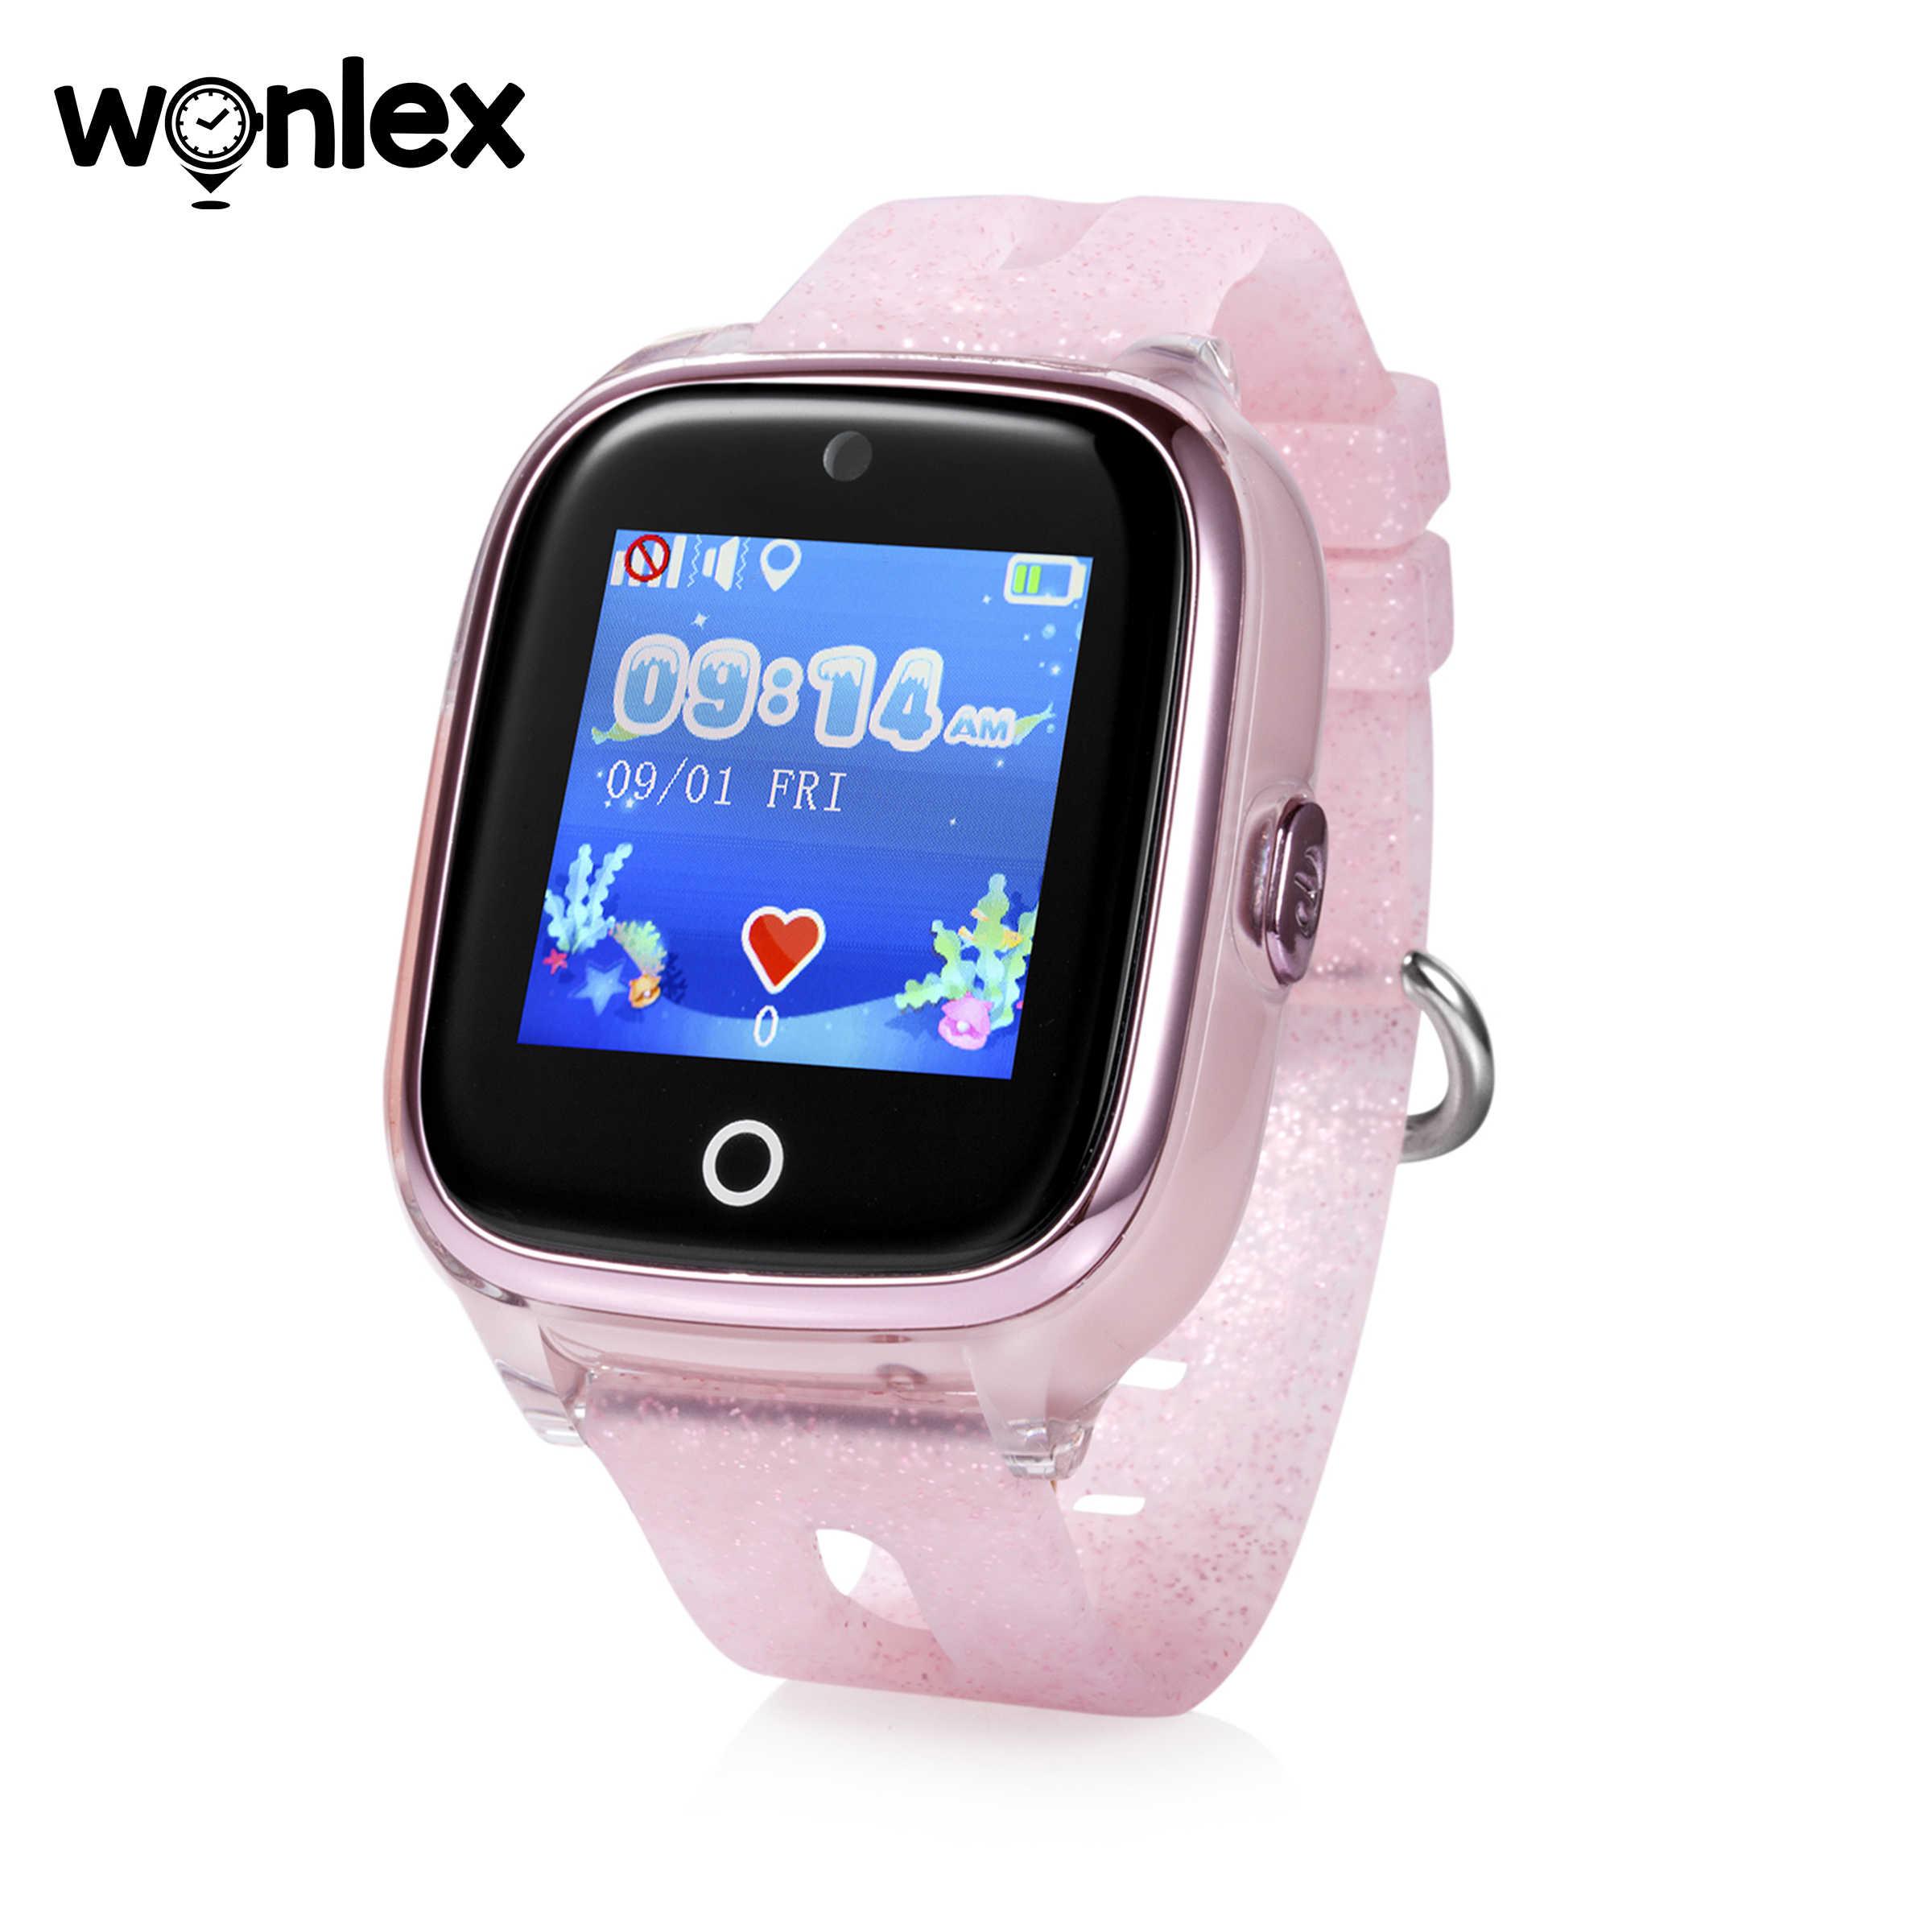 Wonlex GW400S Waterproof IP67 Smart Phone GPS Watch Kids GSM